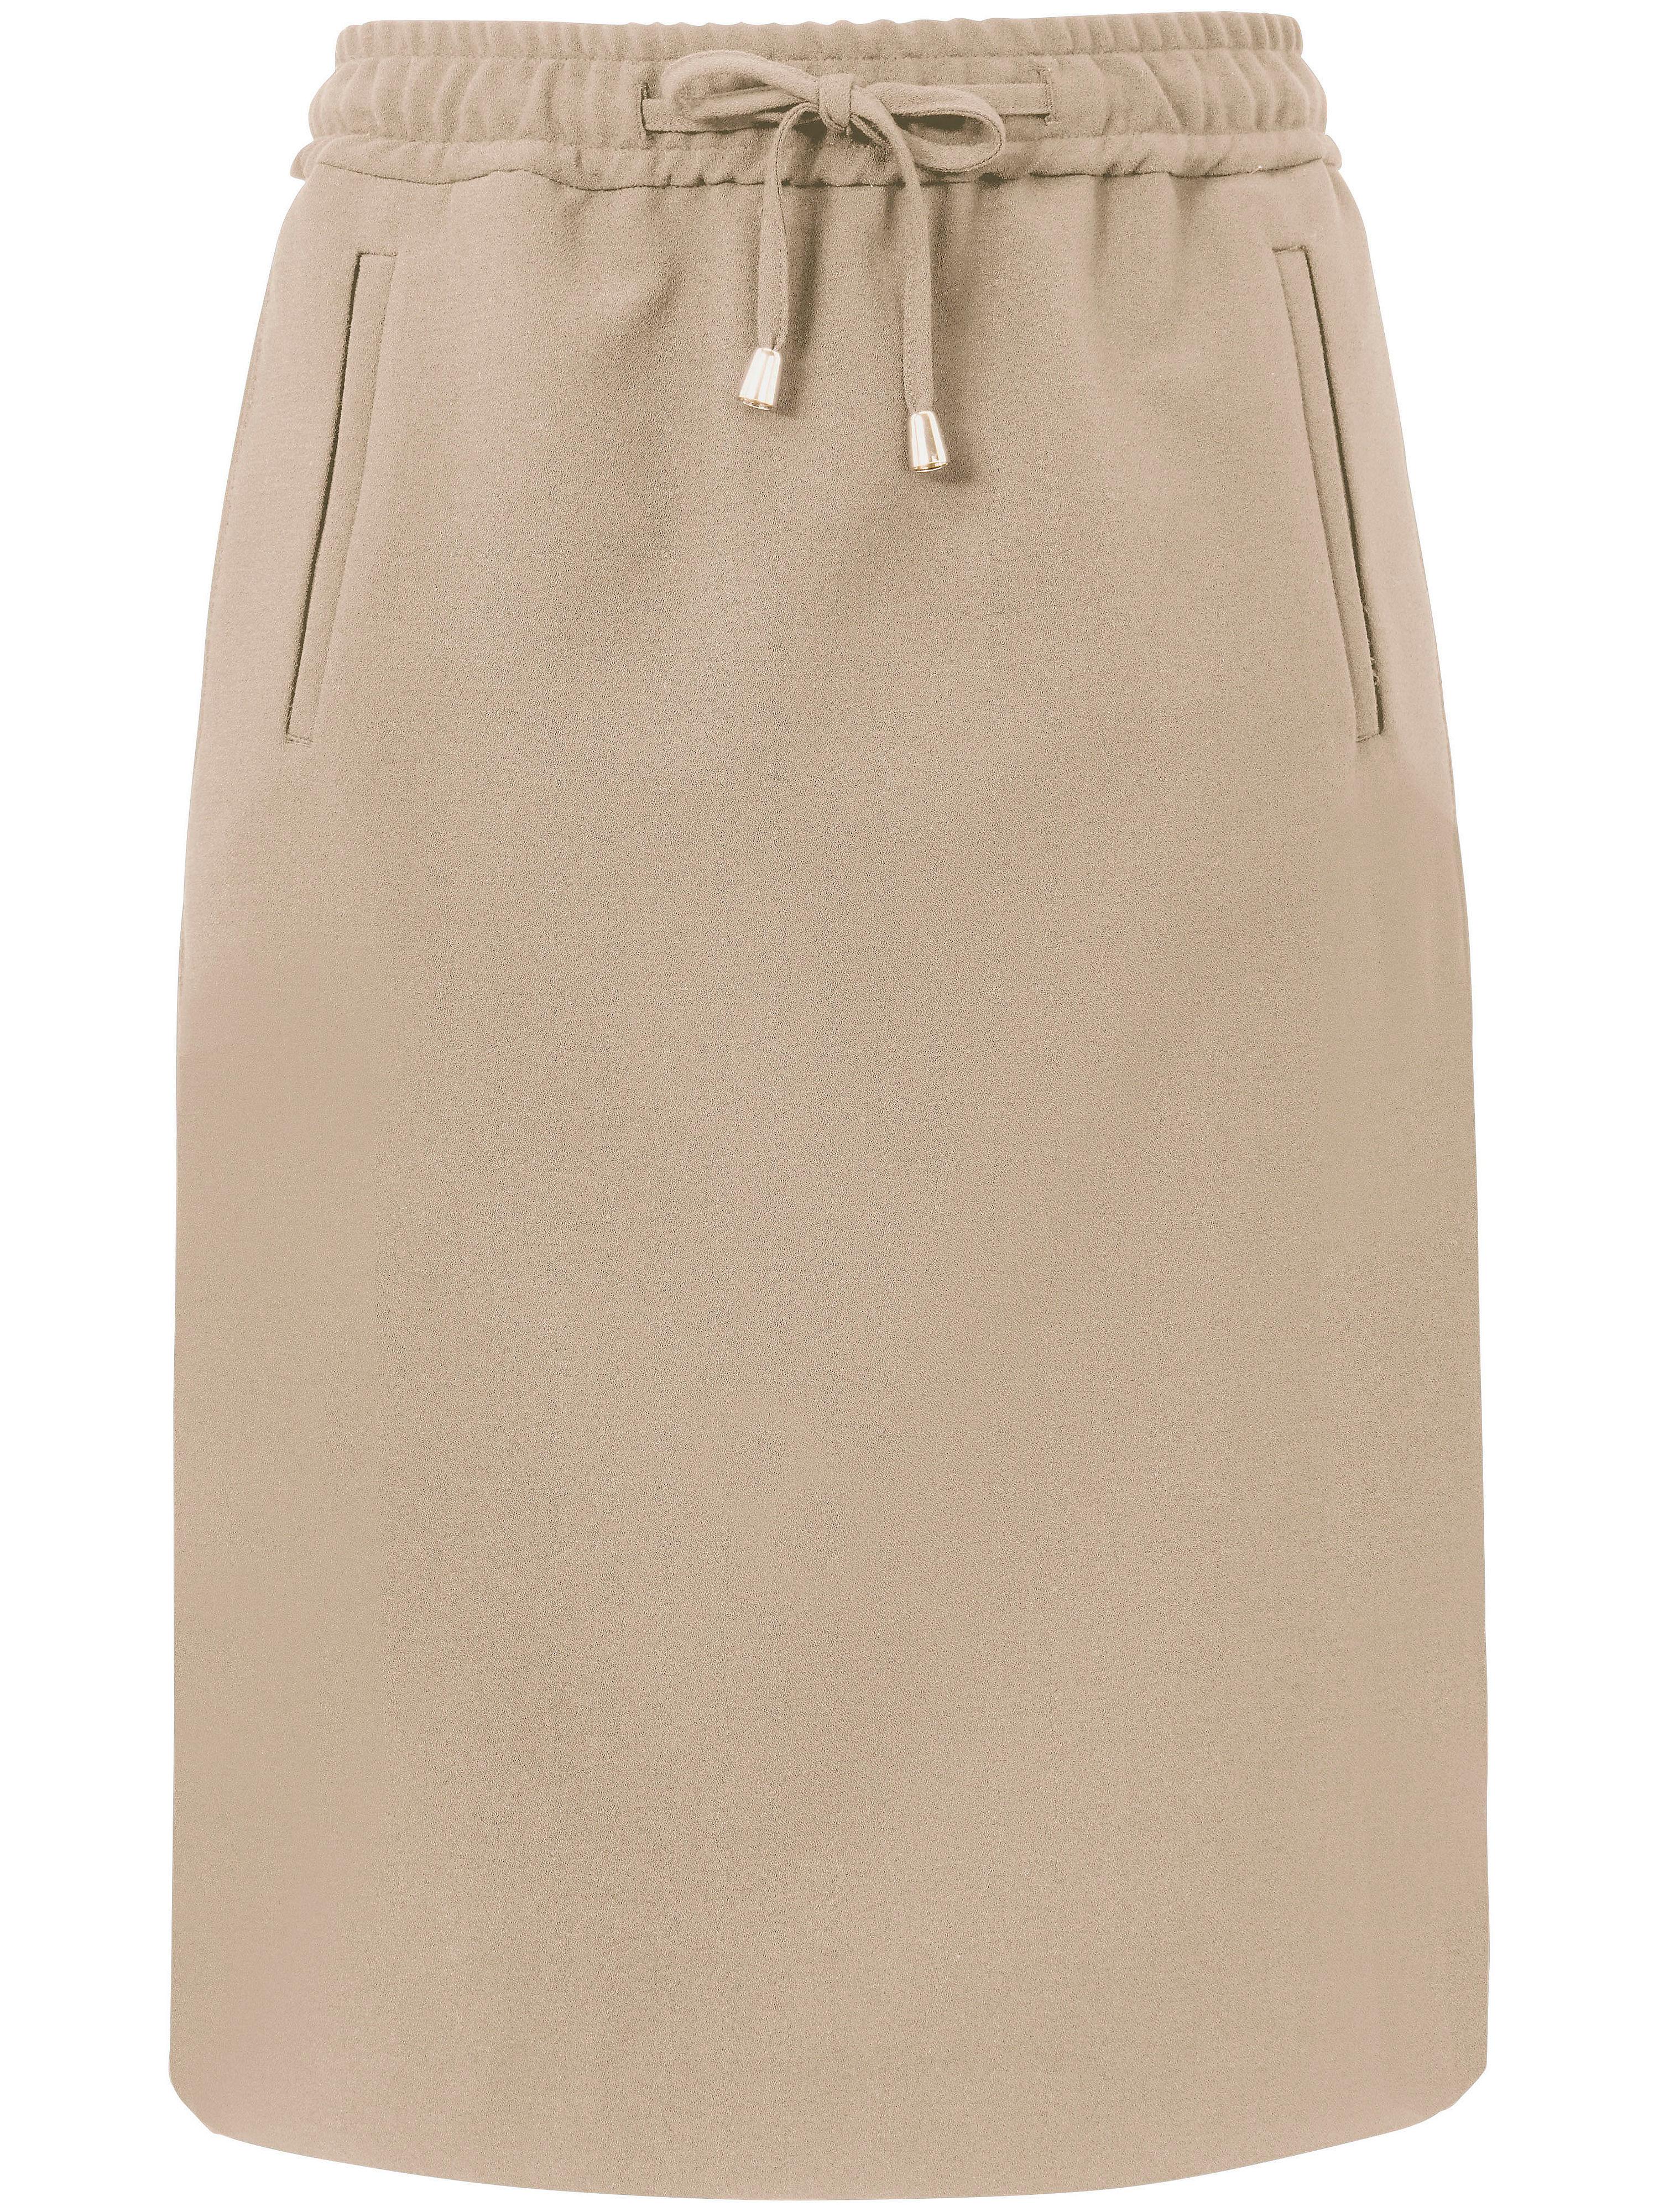 La jupe droite  DAY.LIKE beige